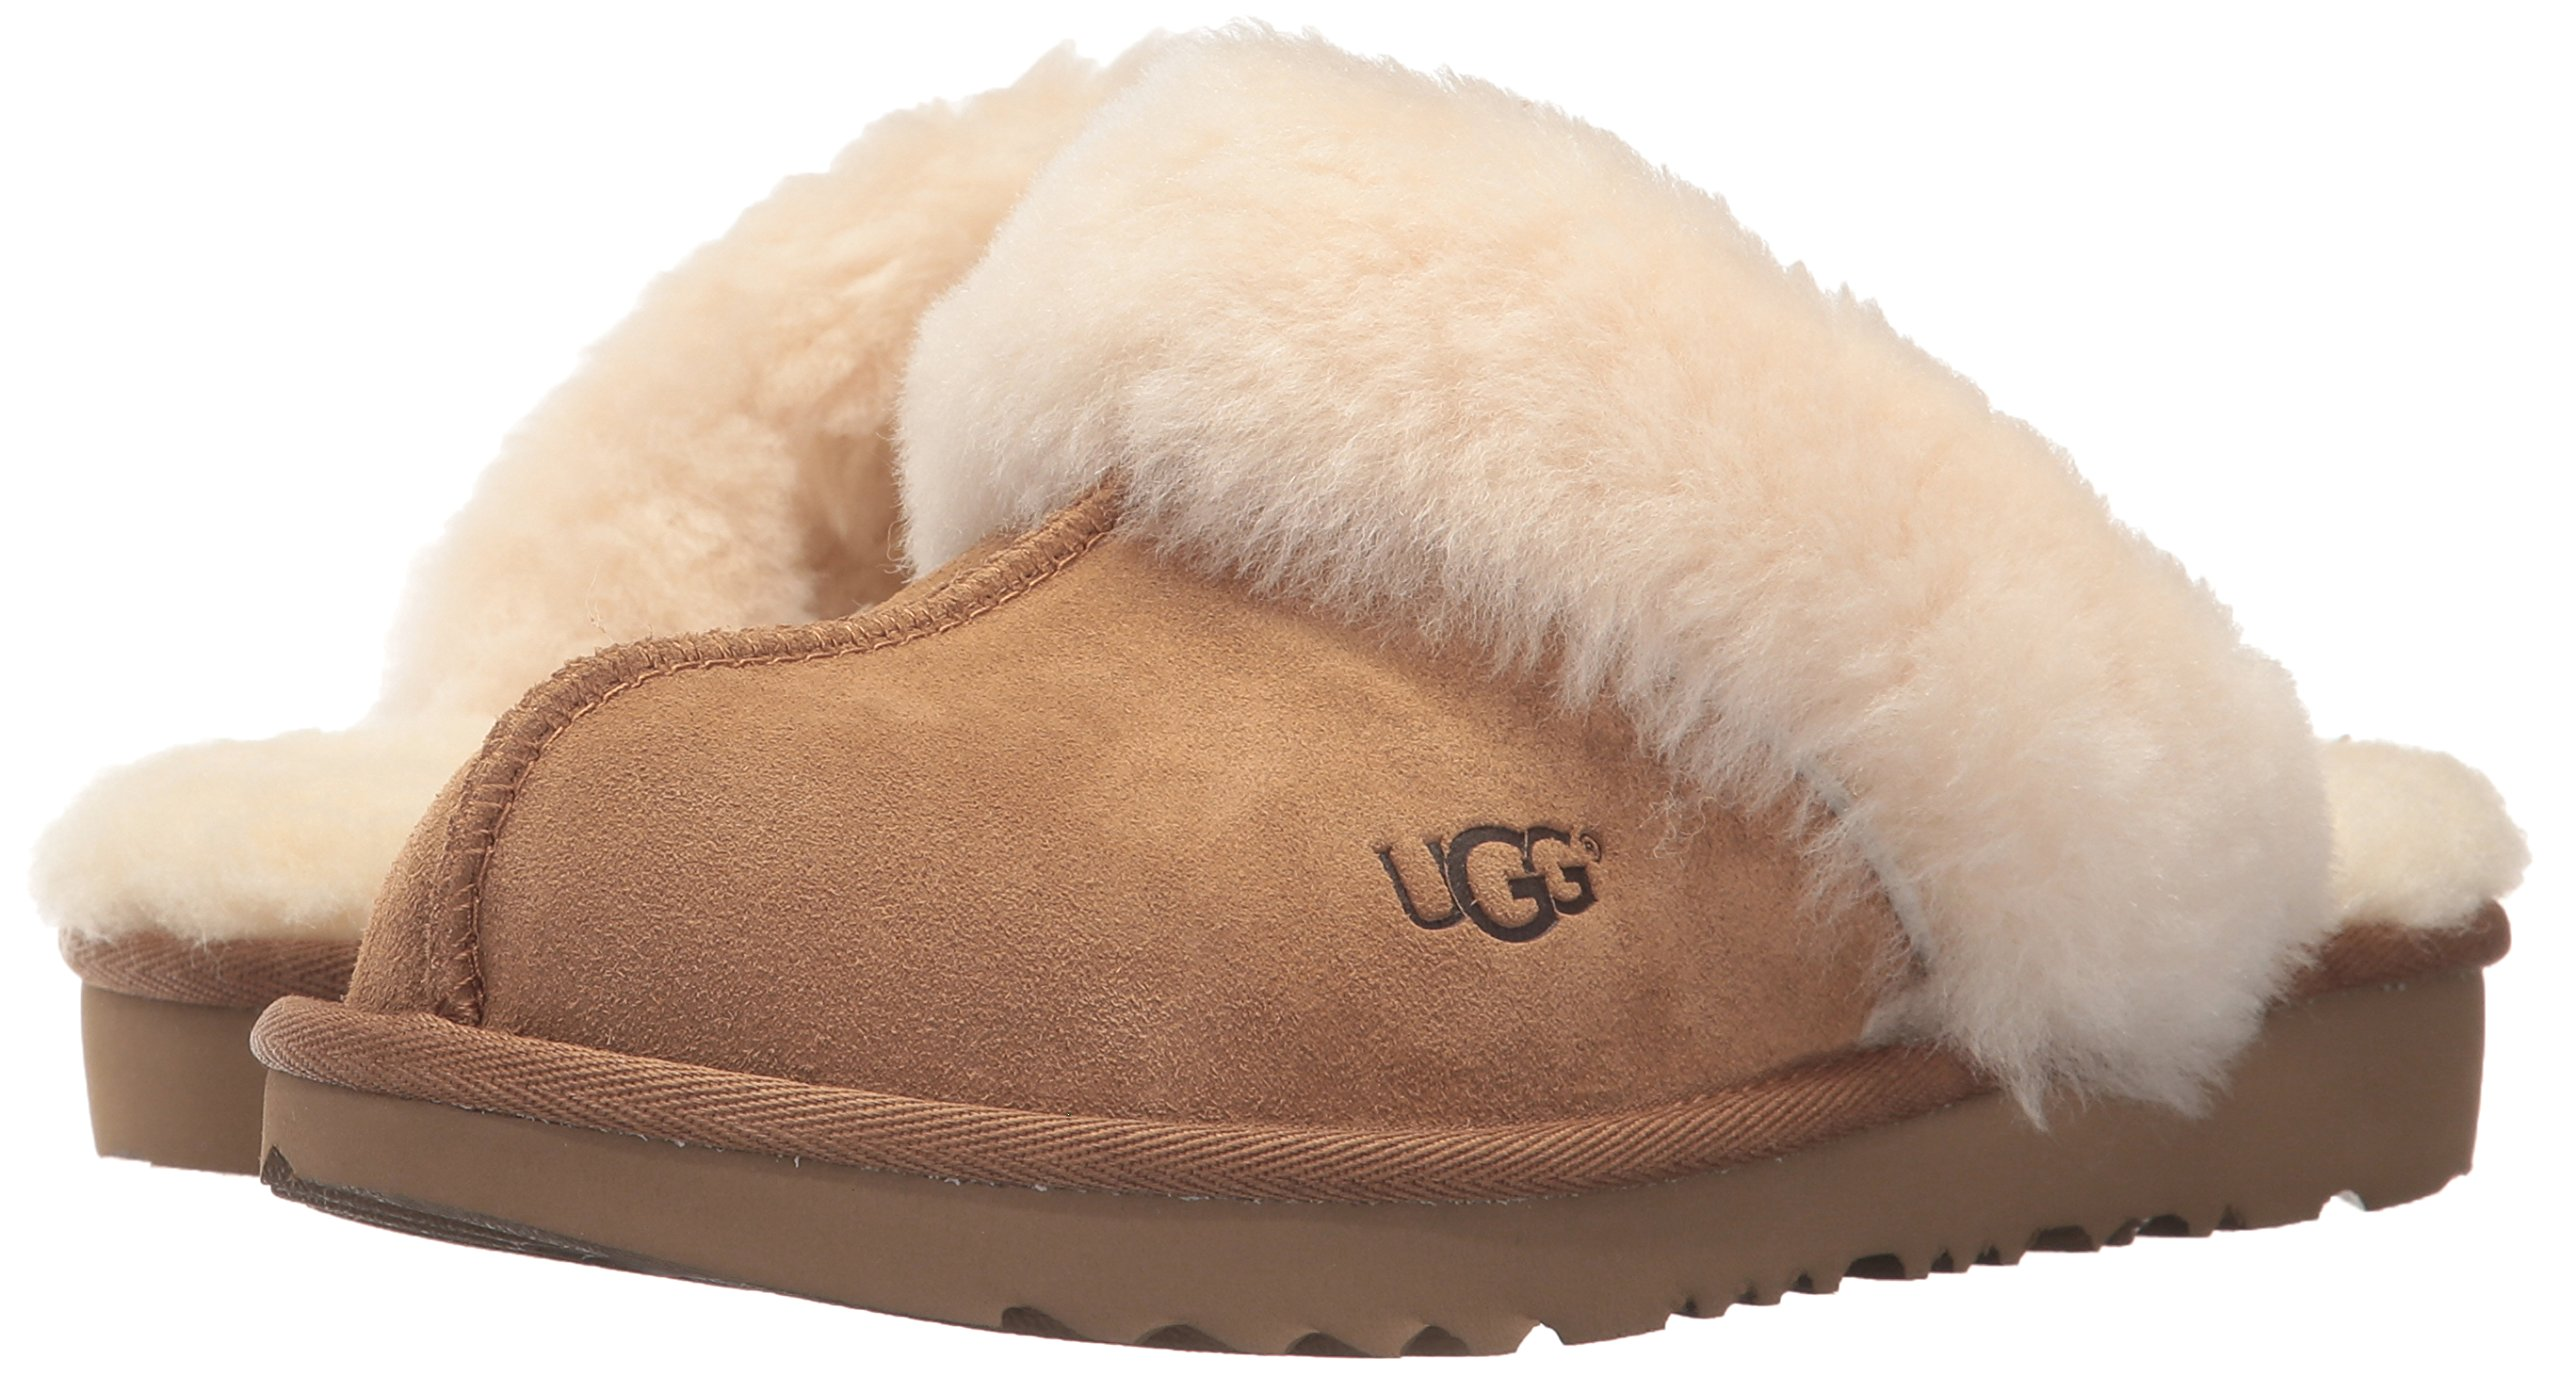 UGG Girls K Cozy II Slipper, Chestnut, 13 M US Little Kid by UGG (Image #6)